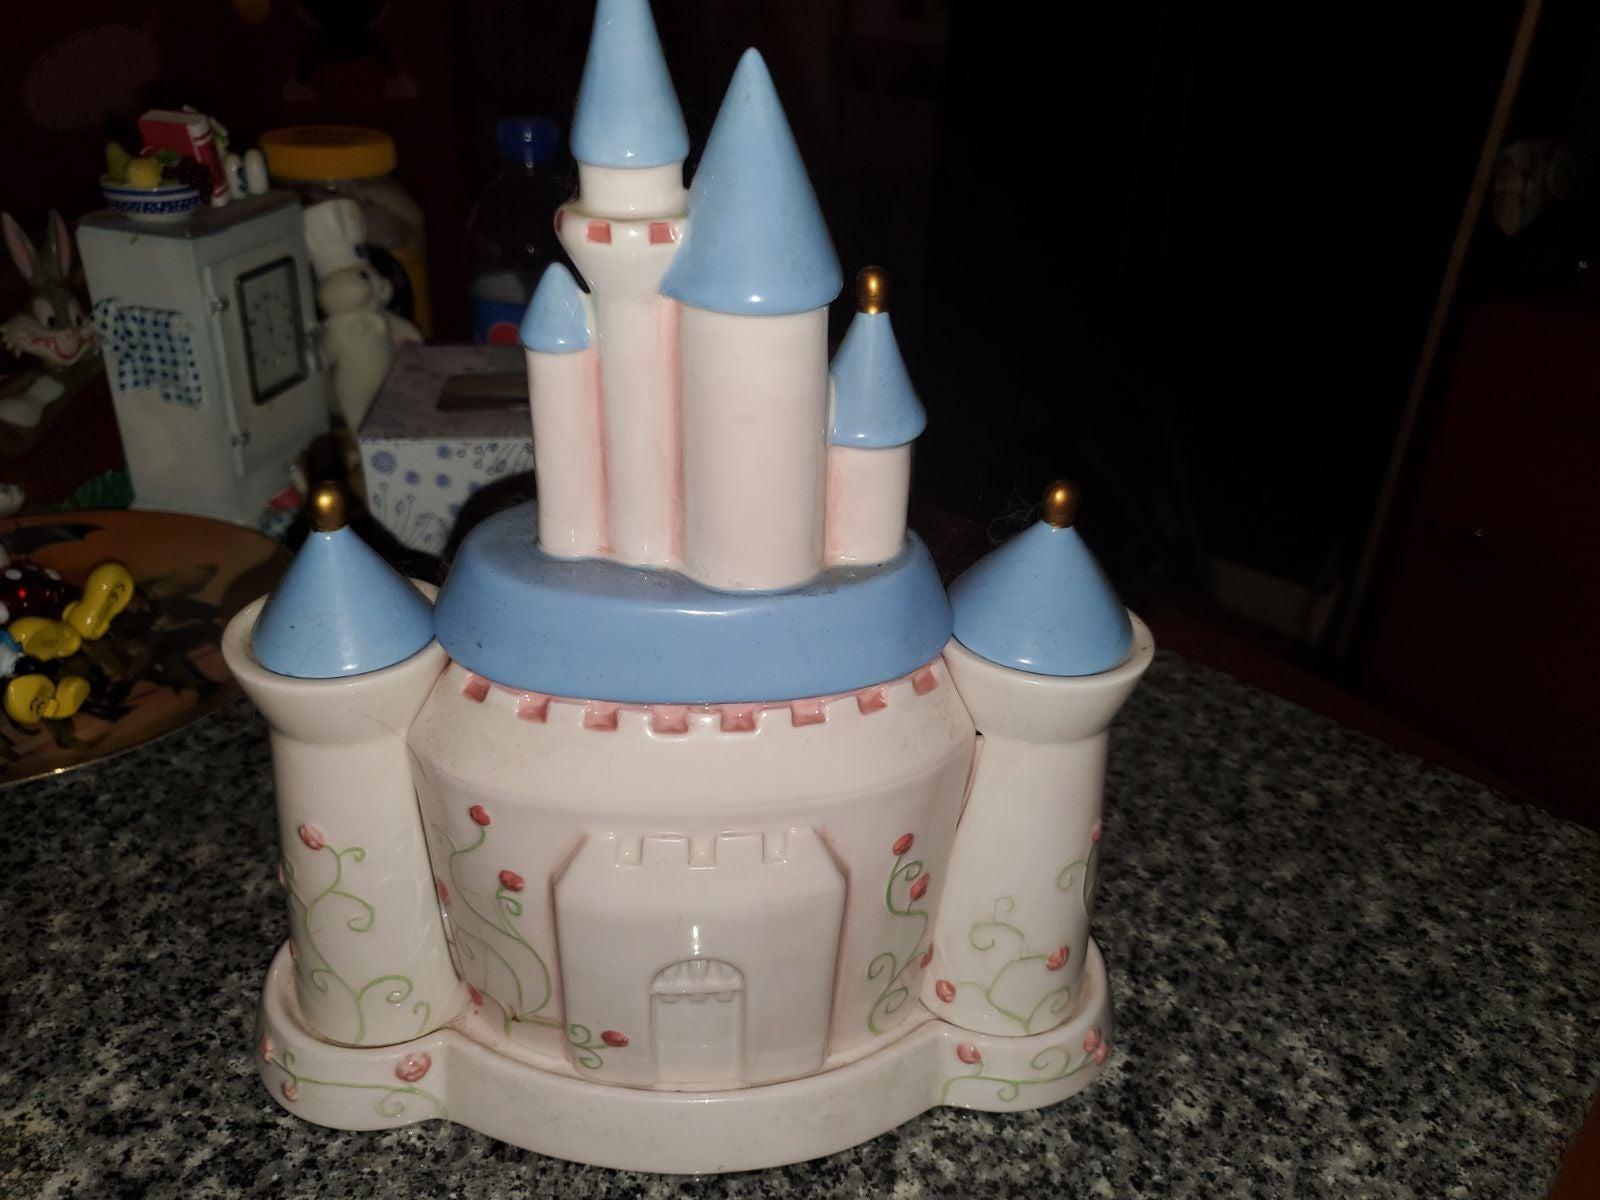 Disneyland Cinderella Tea pot PLZ read